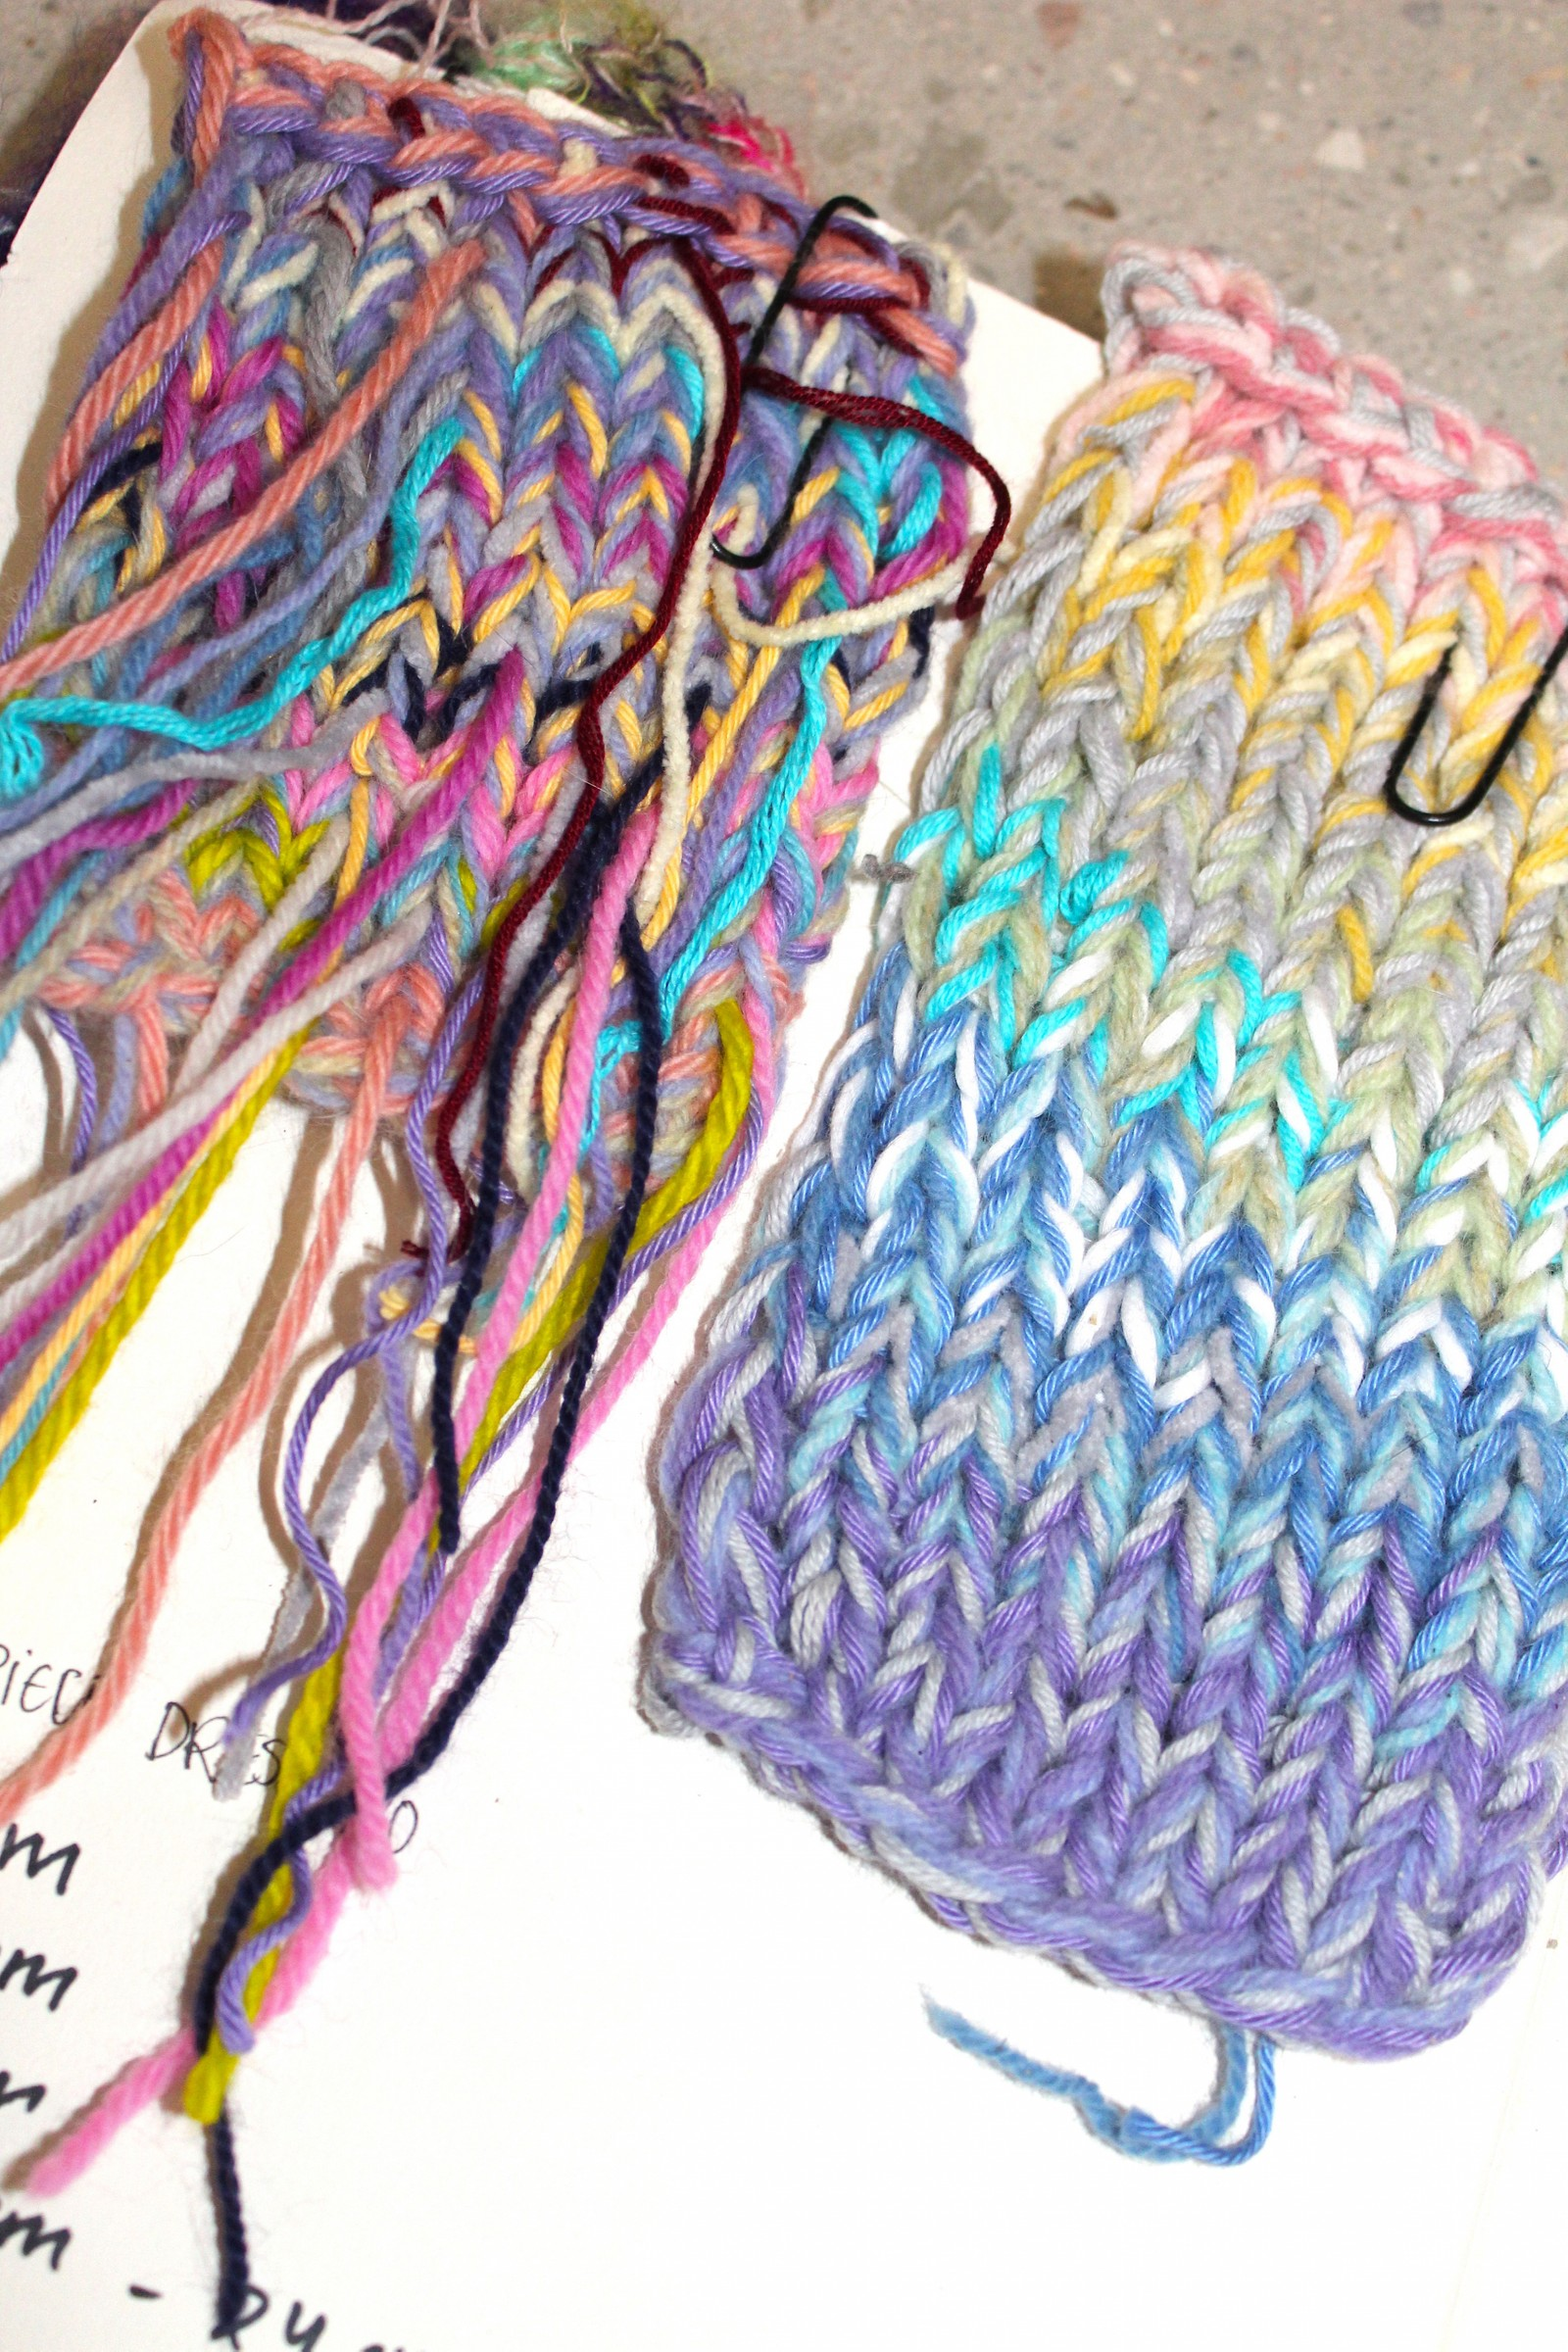 NiTH Studios Knitwear Label Interview Knitting Sustainable Fashion Craftsmanship Copenhagen Brand